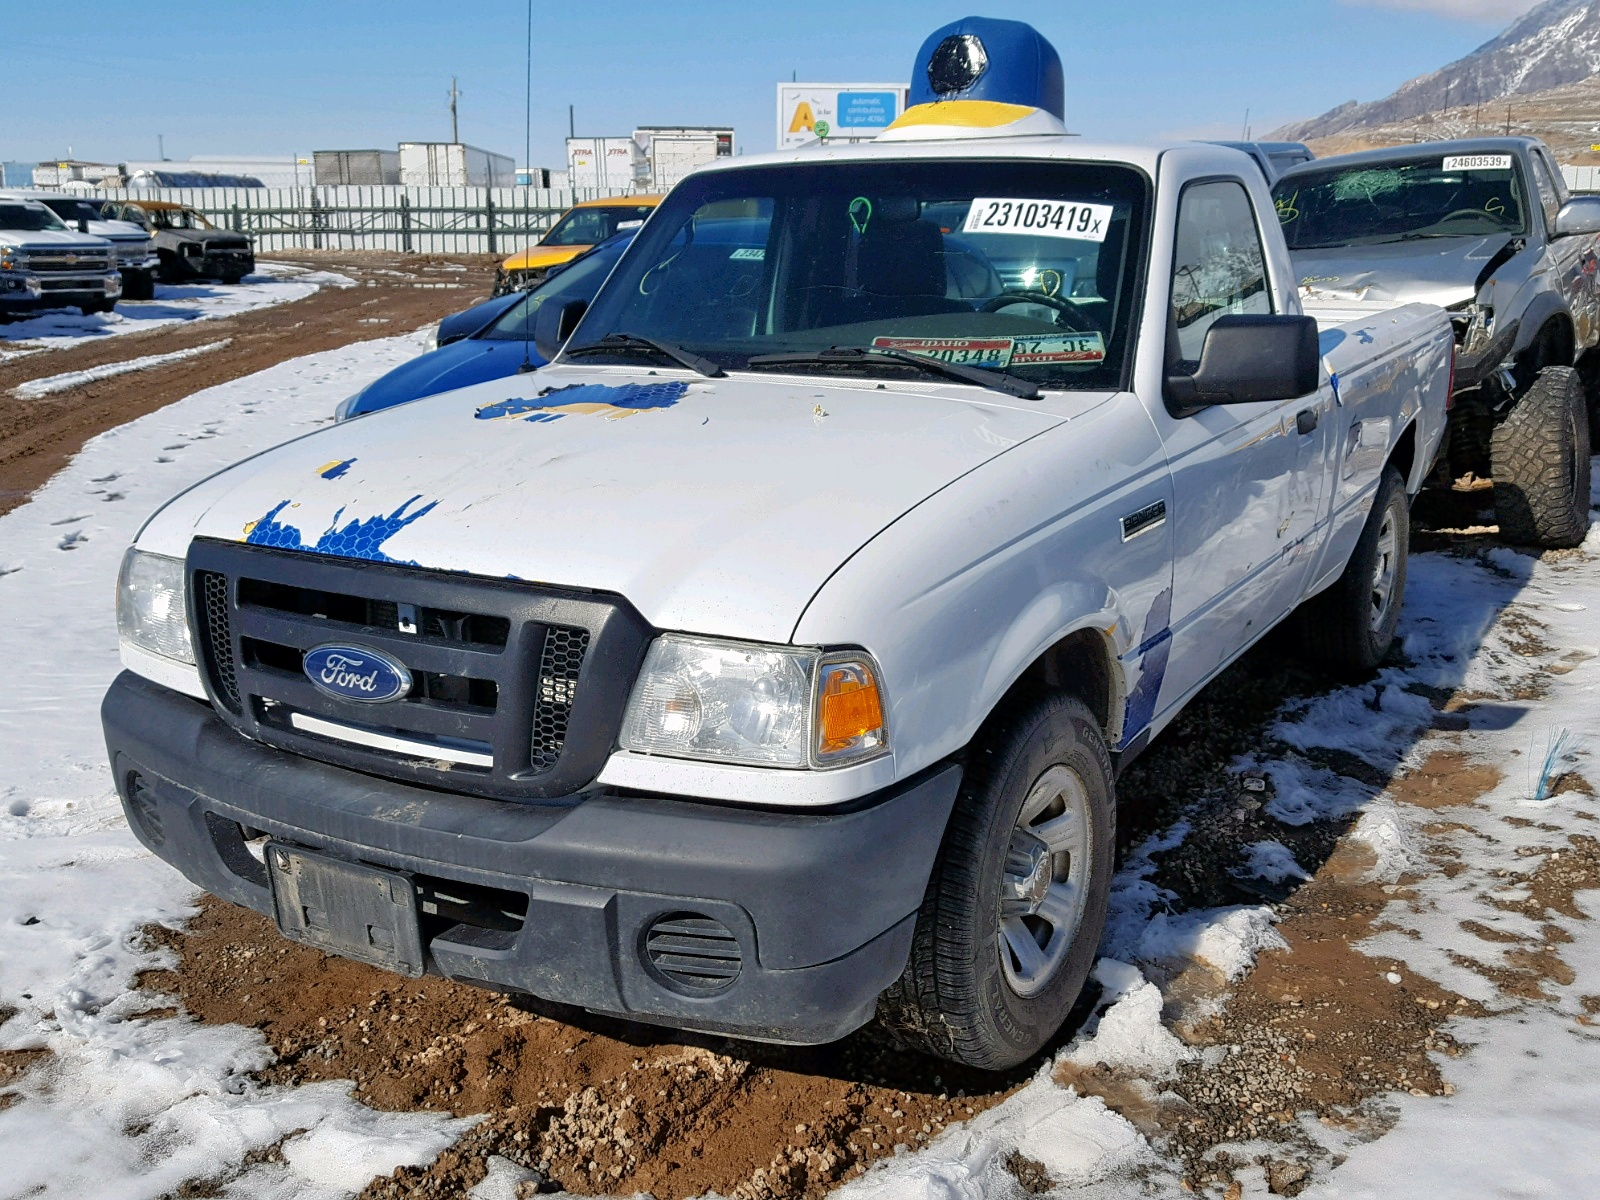 1FTKR1AD0BPA57346 - 2011 Ford Ranger 2.3L Right View